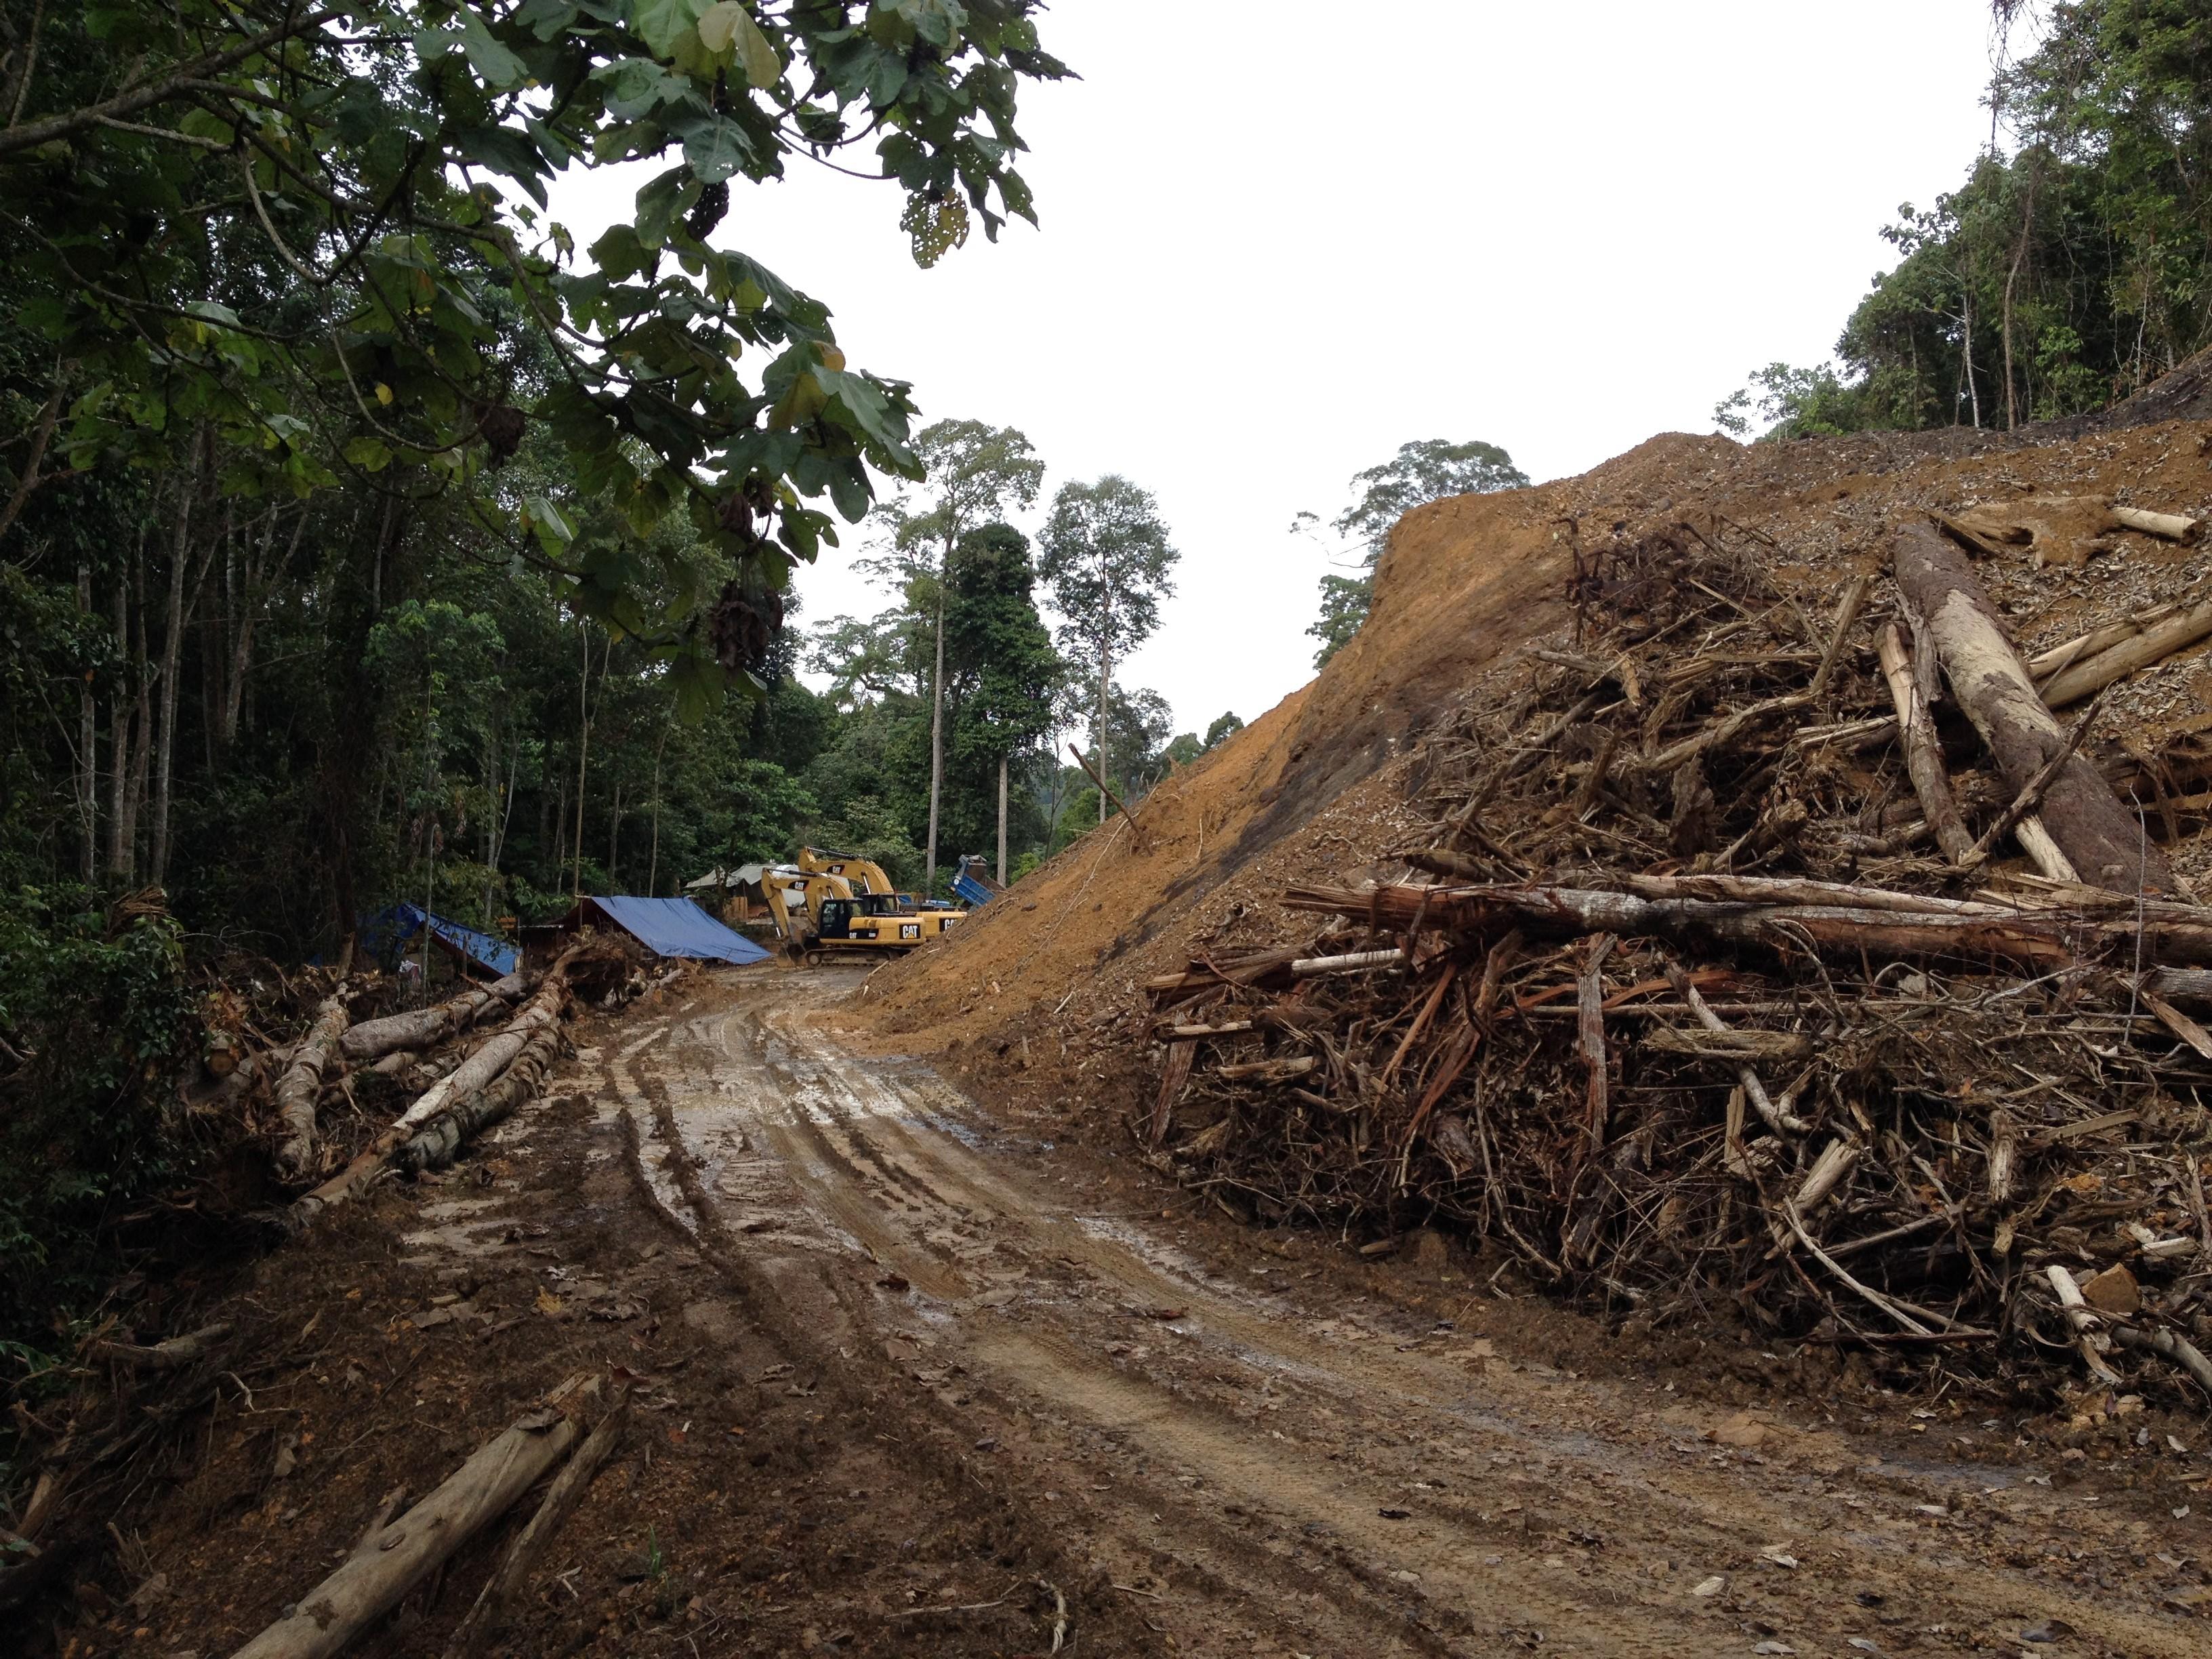 Road construction Sabah TNC © Joerg Hartmann